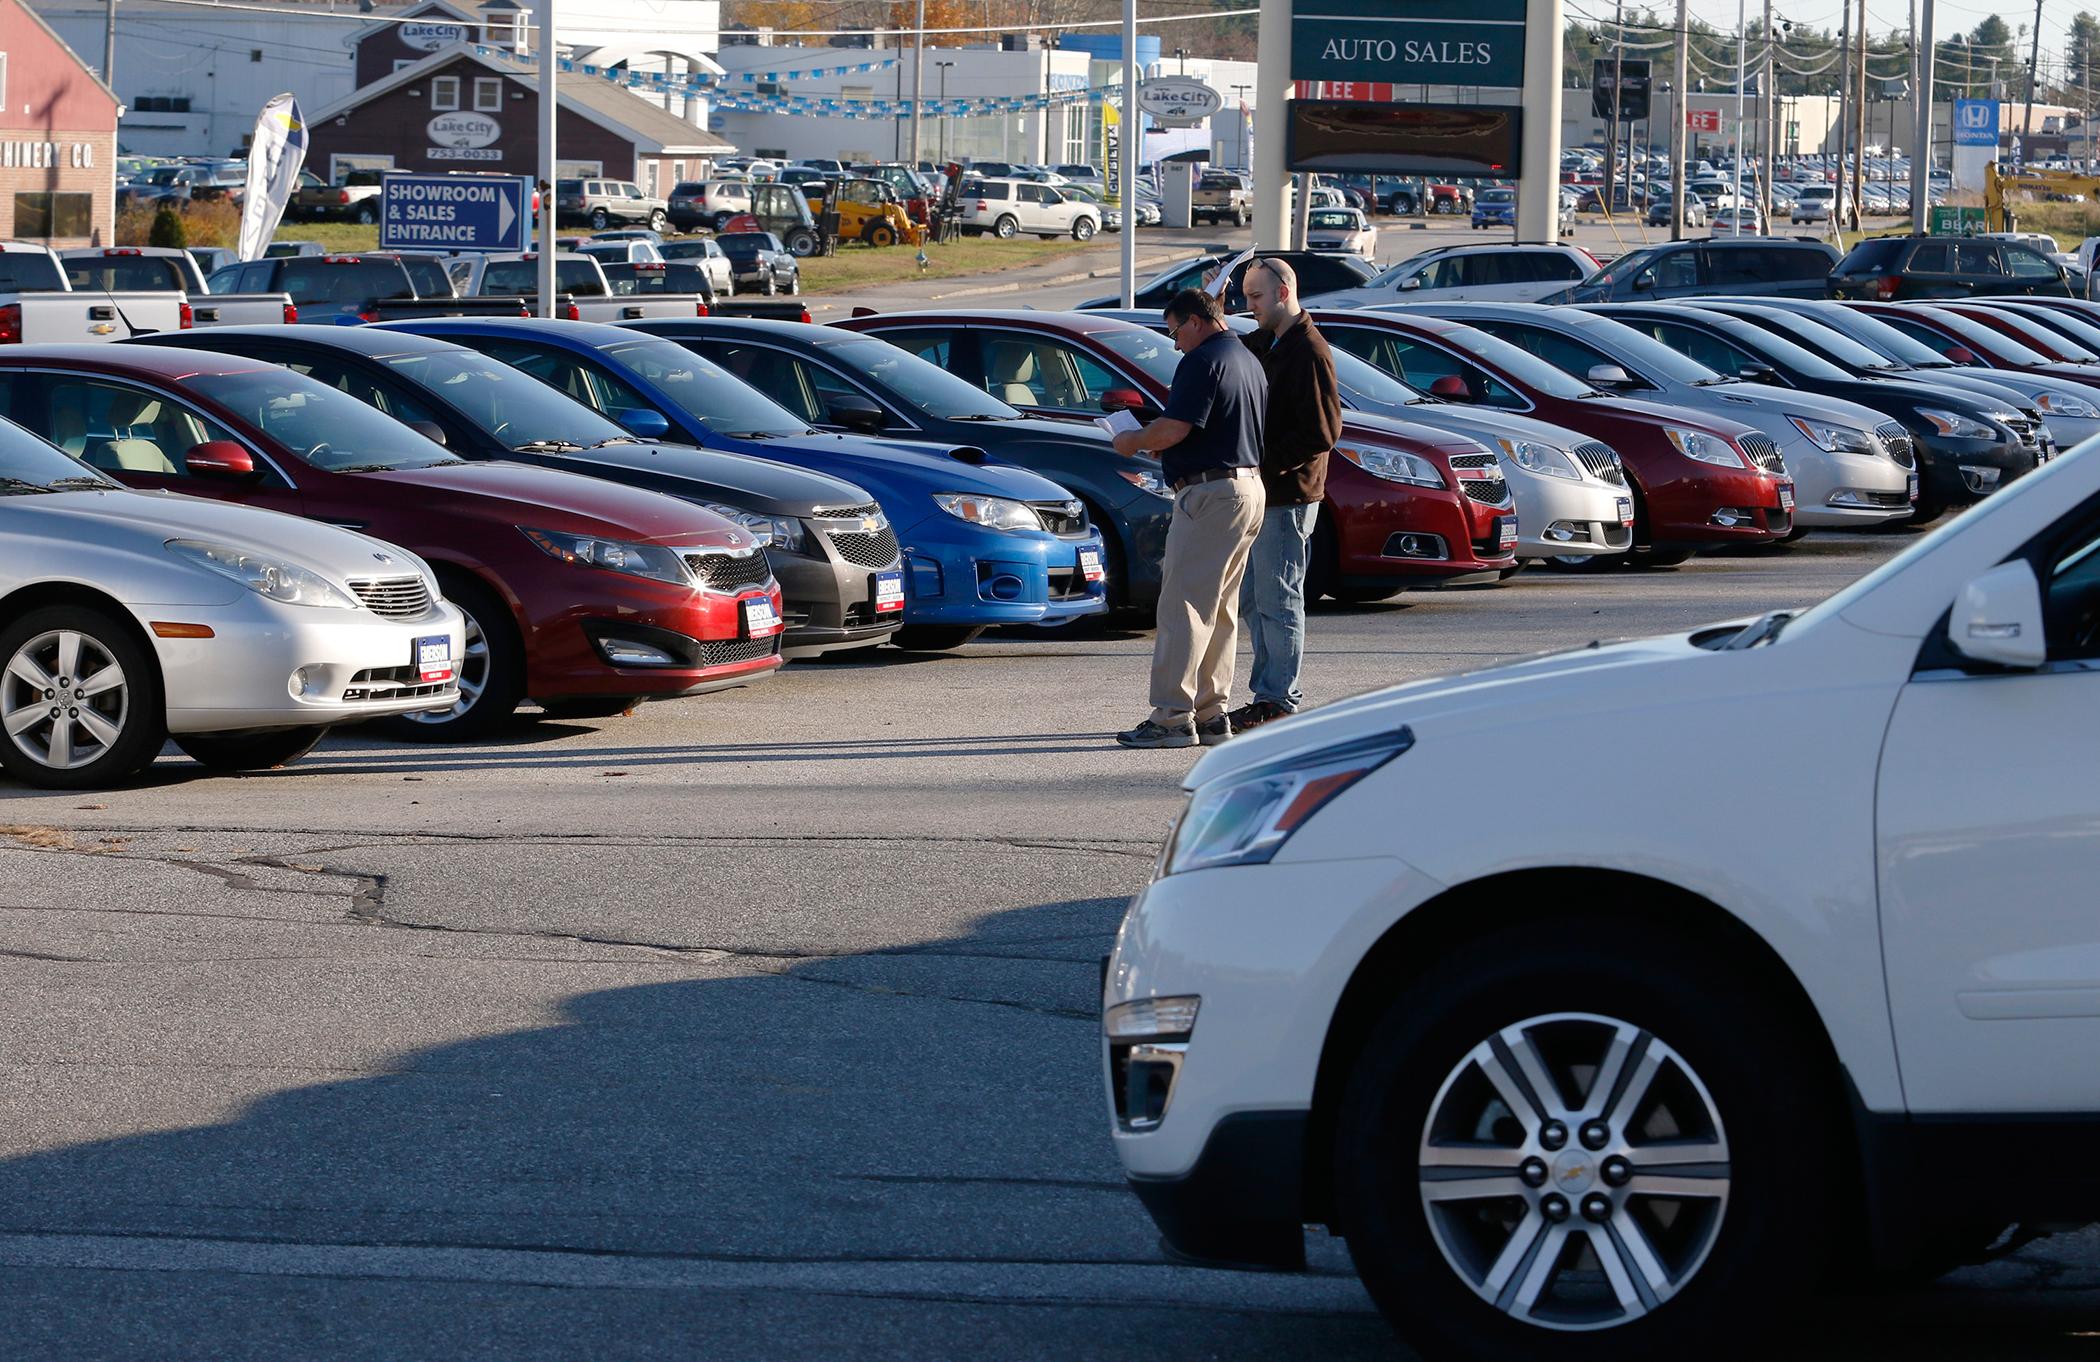 The Emerson Inc. car dealership is seen Wednesday, November 4, 2015 in Auburn, Maine.